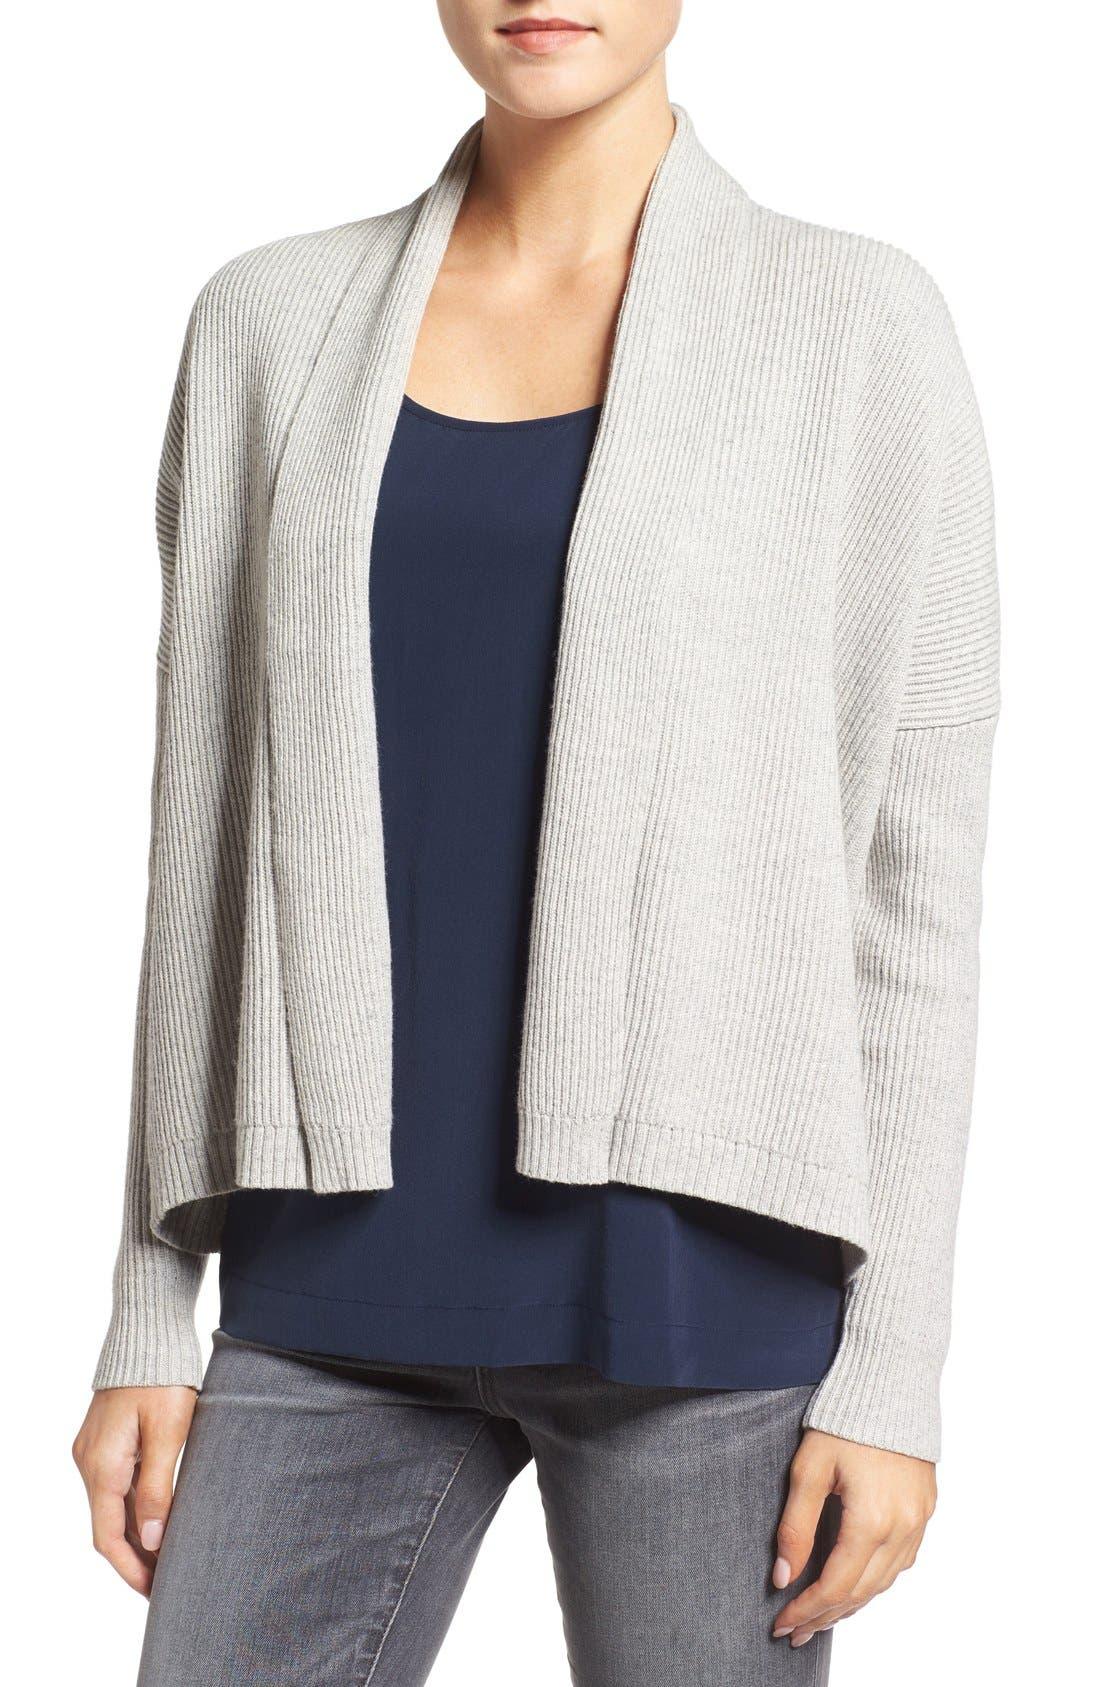 MADEWELL Ribbed Shawl Collar Cardigan, Main, color, 022